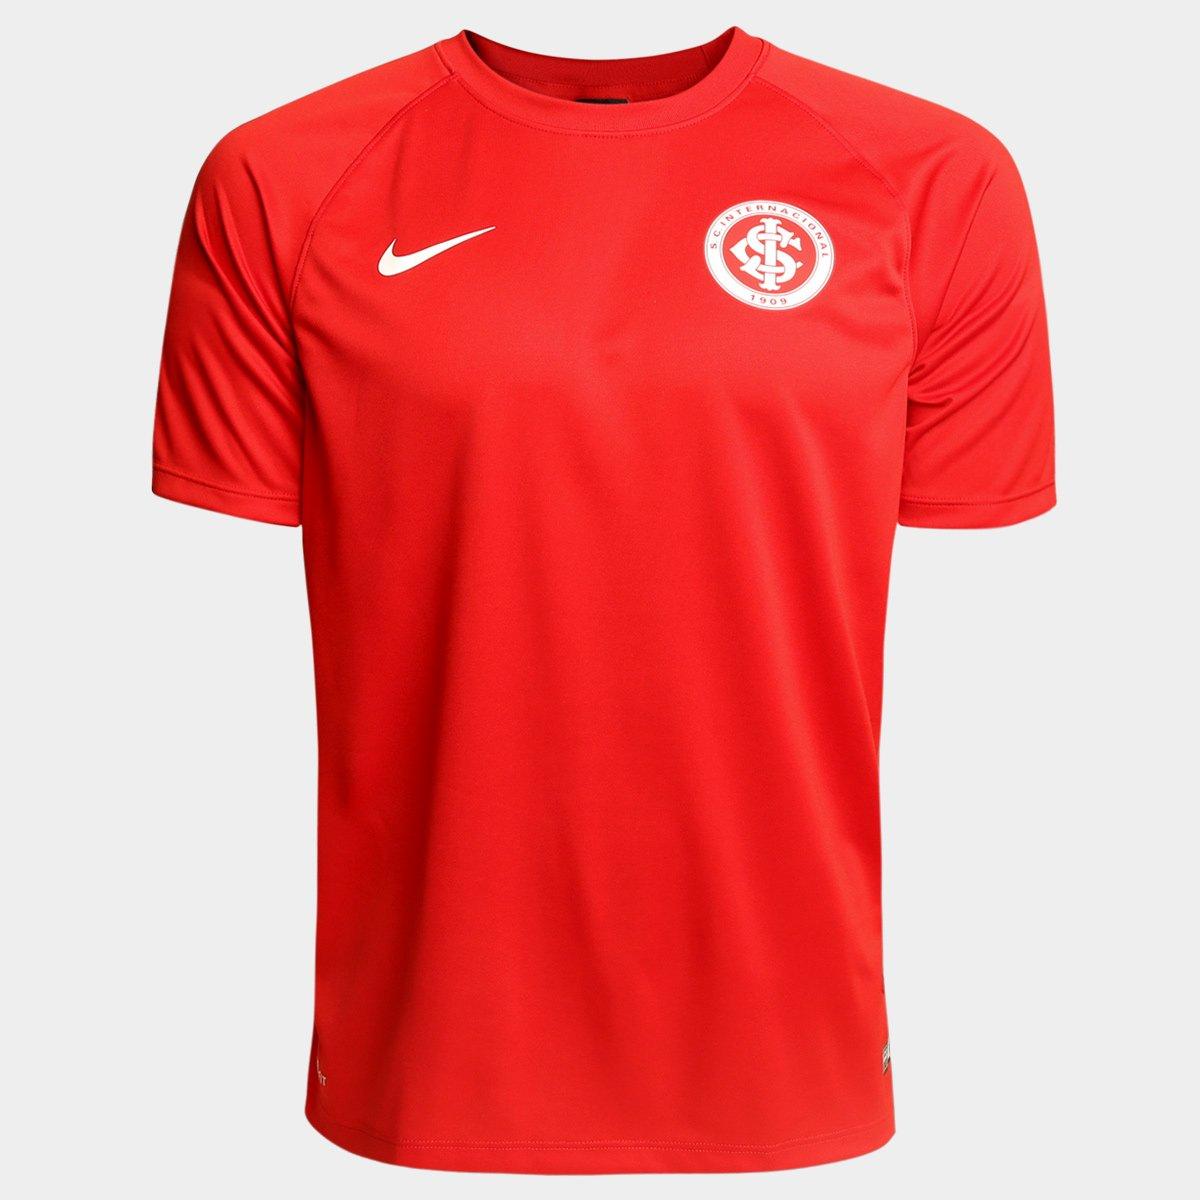 7e9b70b1c8 Camisa Internacional Réplica I 15 16 s nº - Torcedor Nike Masculina -  Compre Agora